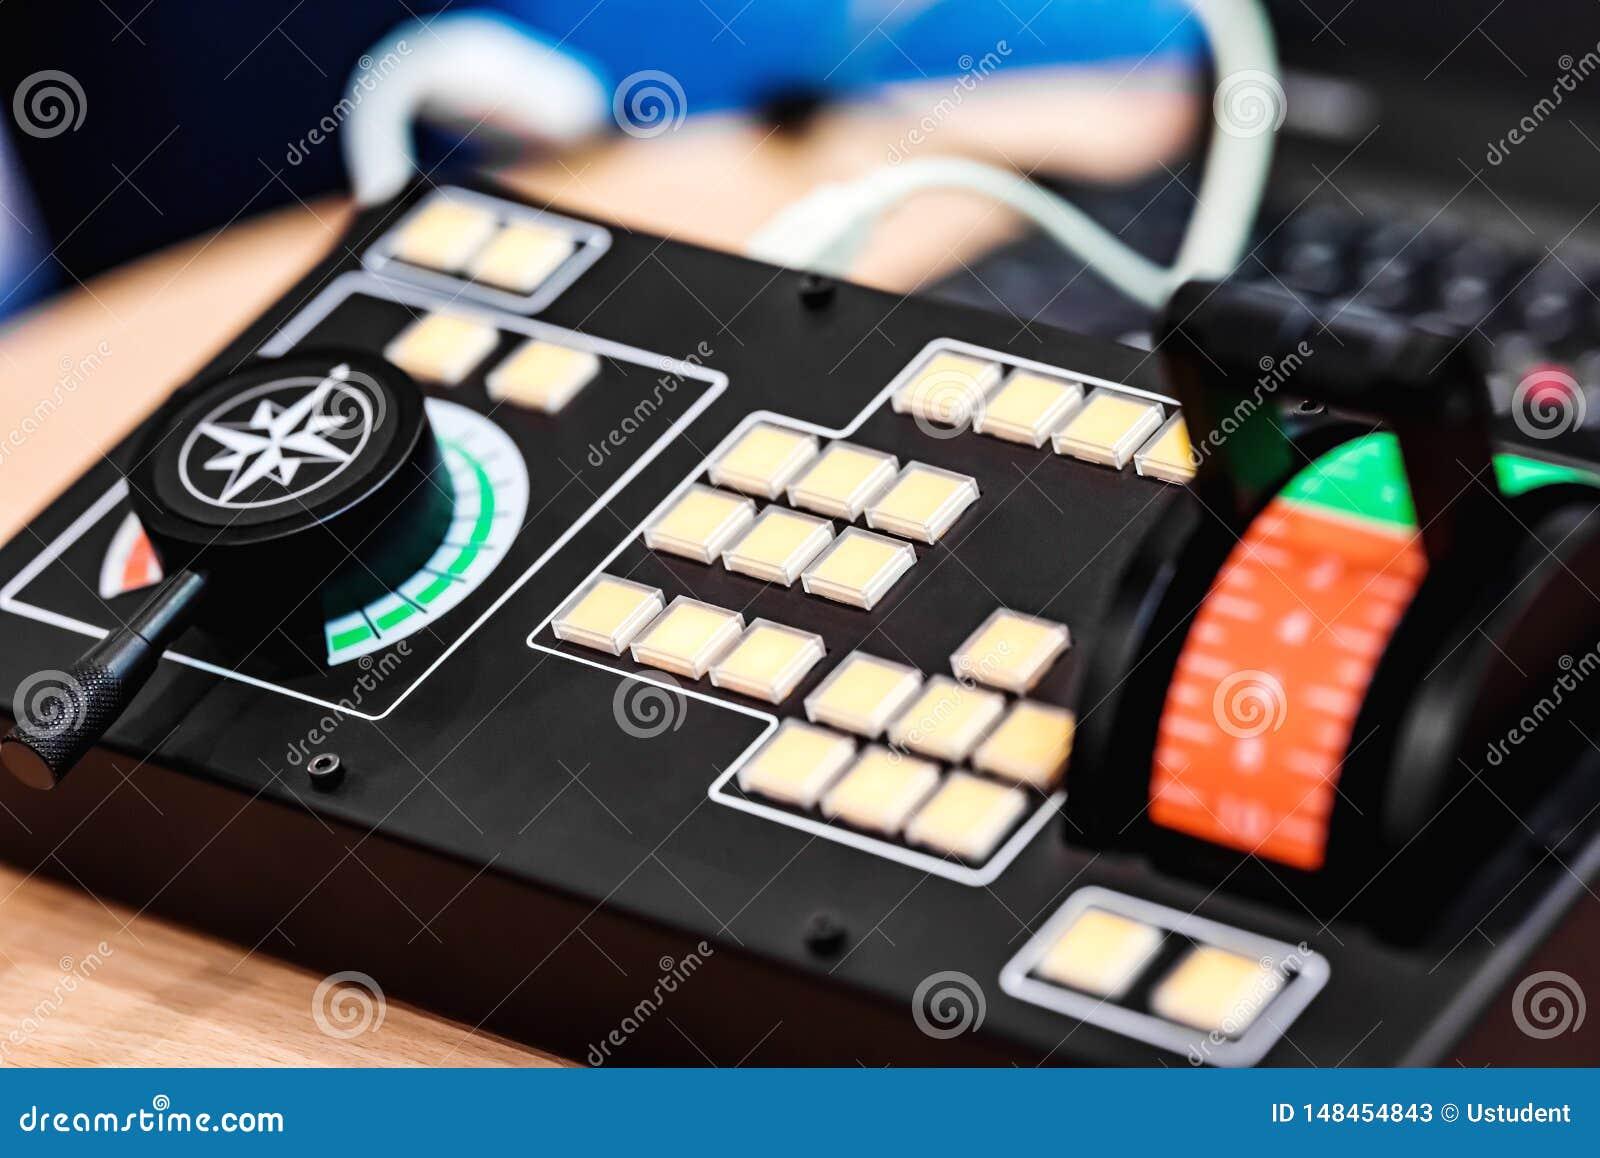 Elektronisch controlebord